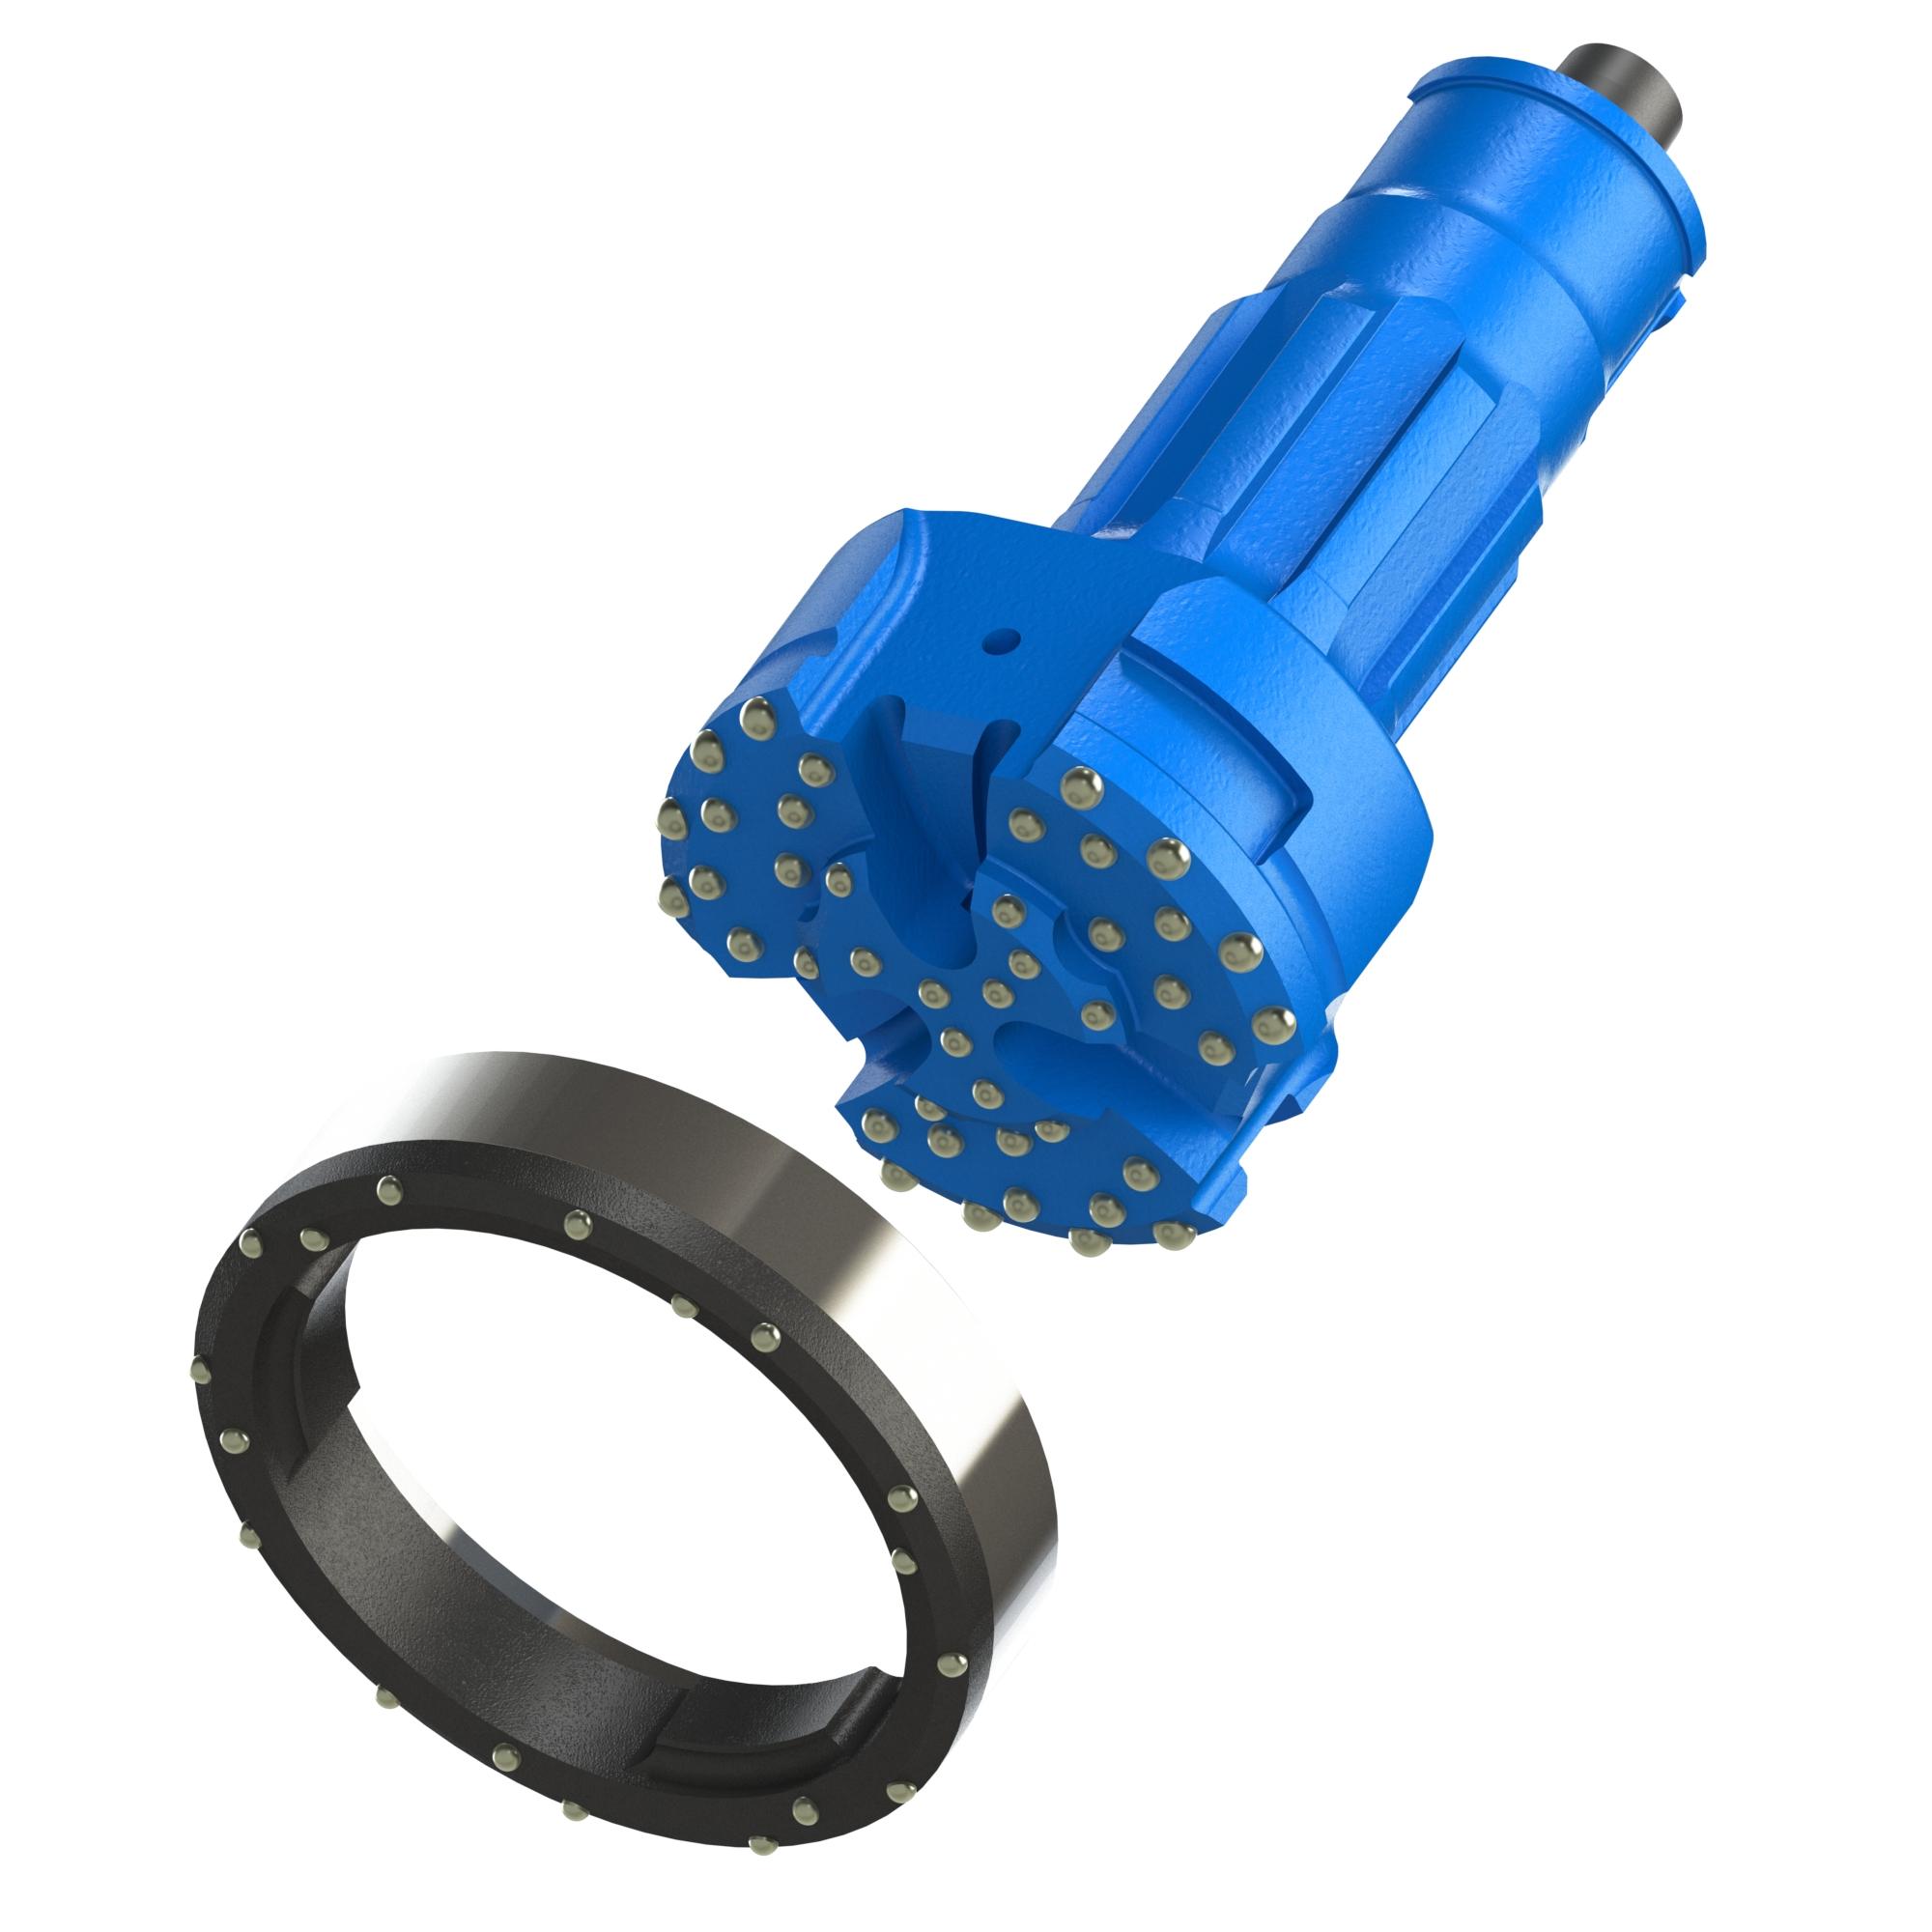 Mincon Drill-Through Systems